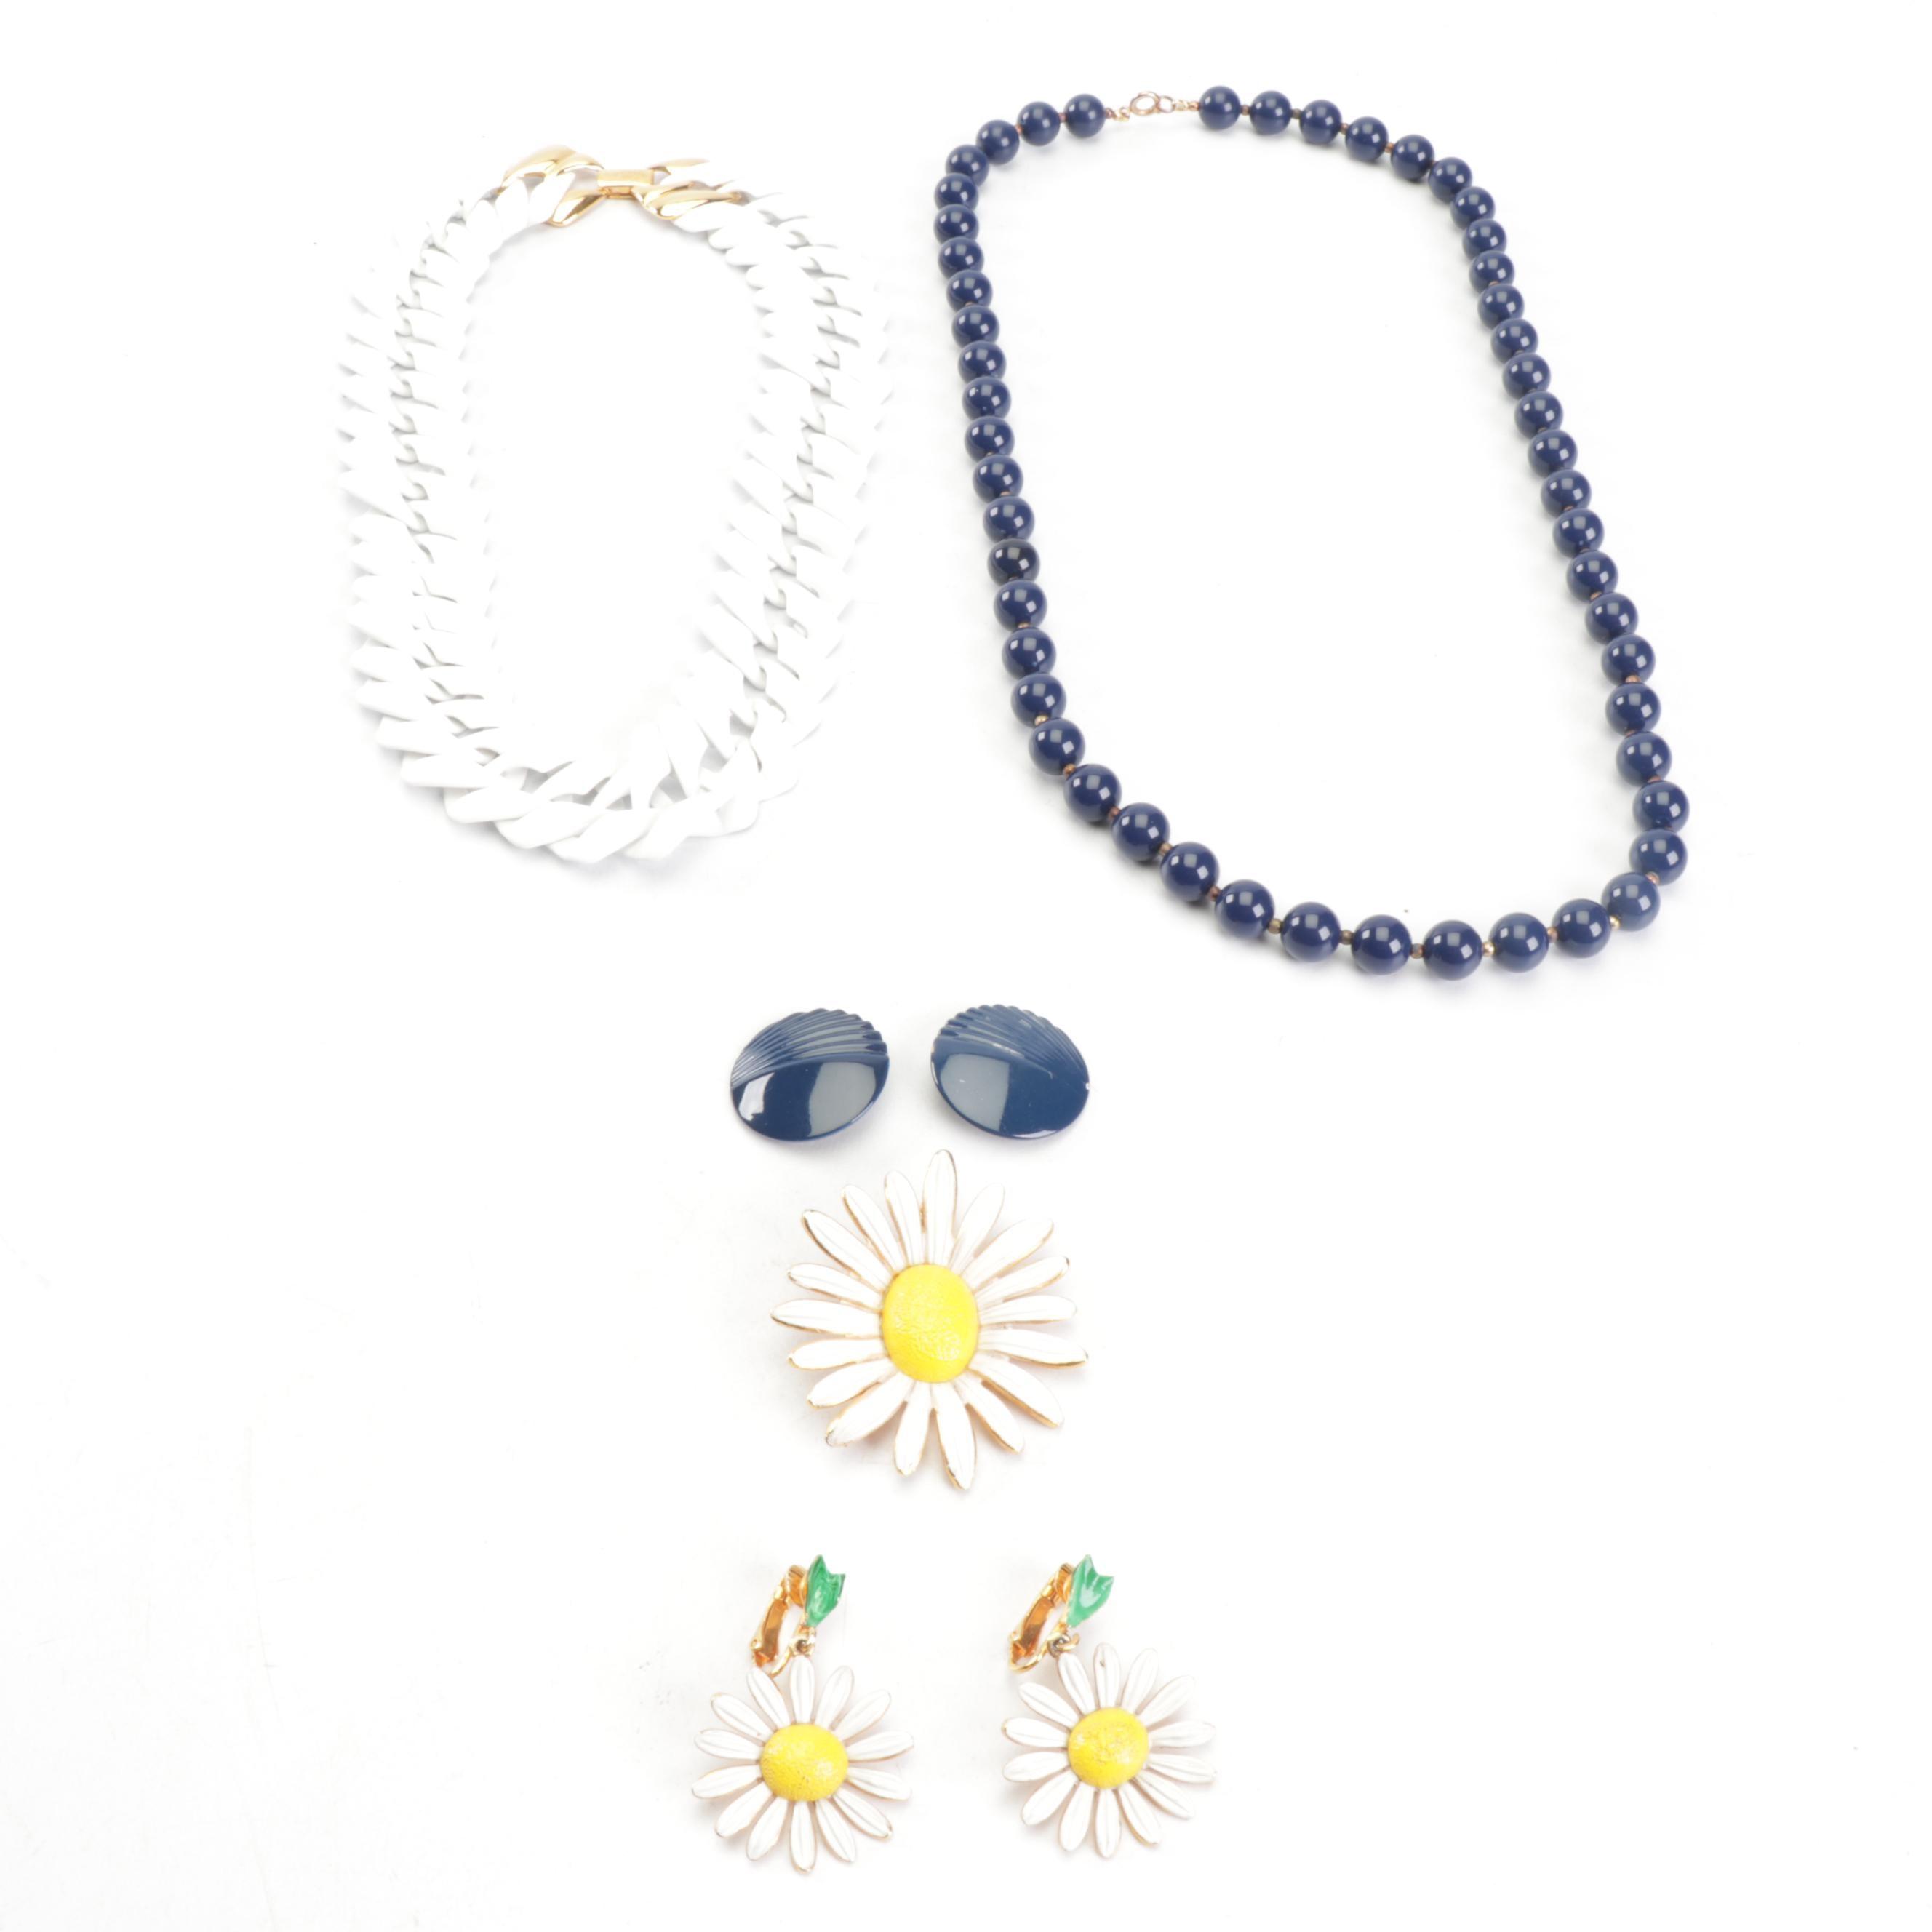 Napier Serpentine Necklace and Metal & Enamel Jewelry, Circa 1970